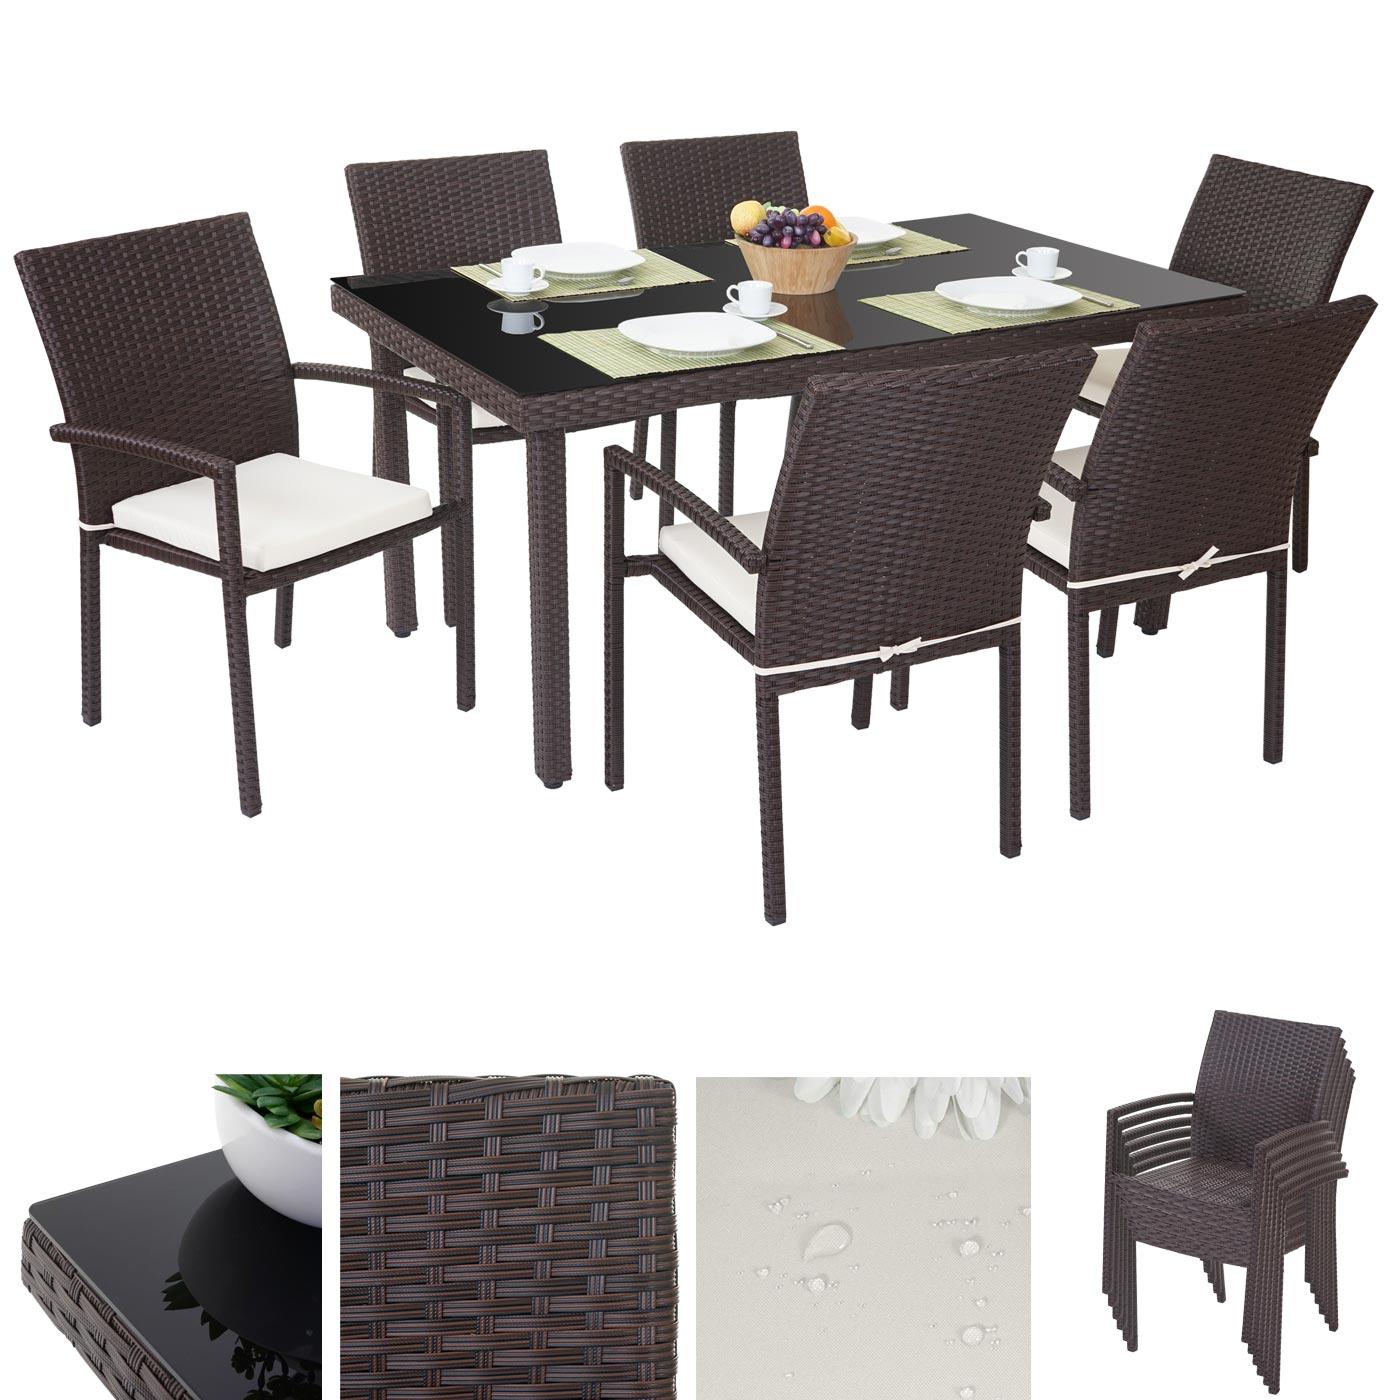 gartensitzgruppe rattan. Black Bedroom Furniture Sets. Home Design Ideas